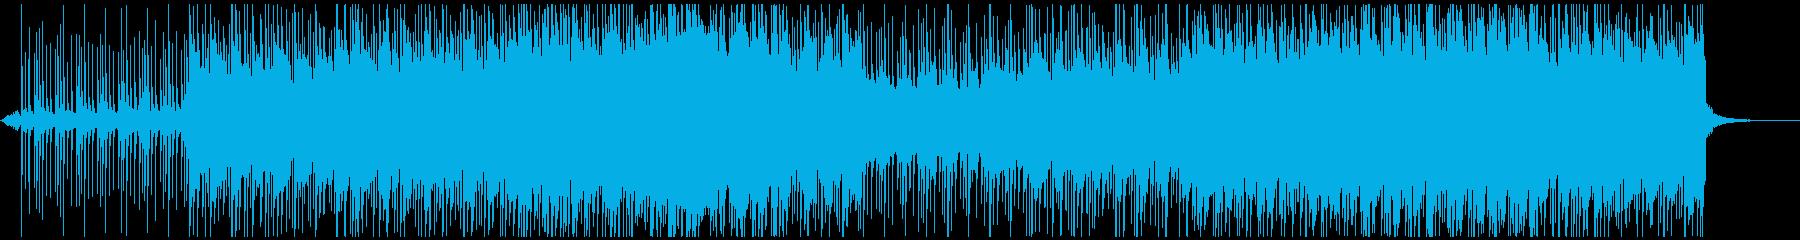 Cold Waterの再生済みの波形